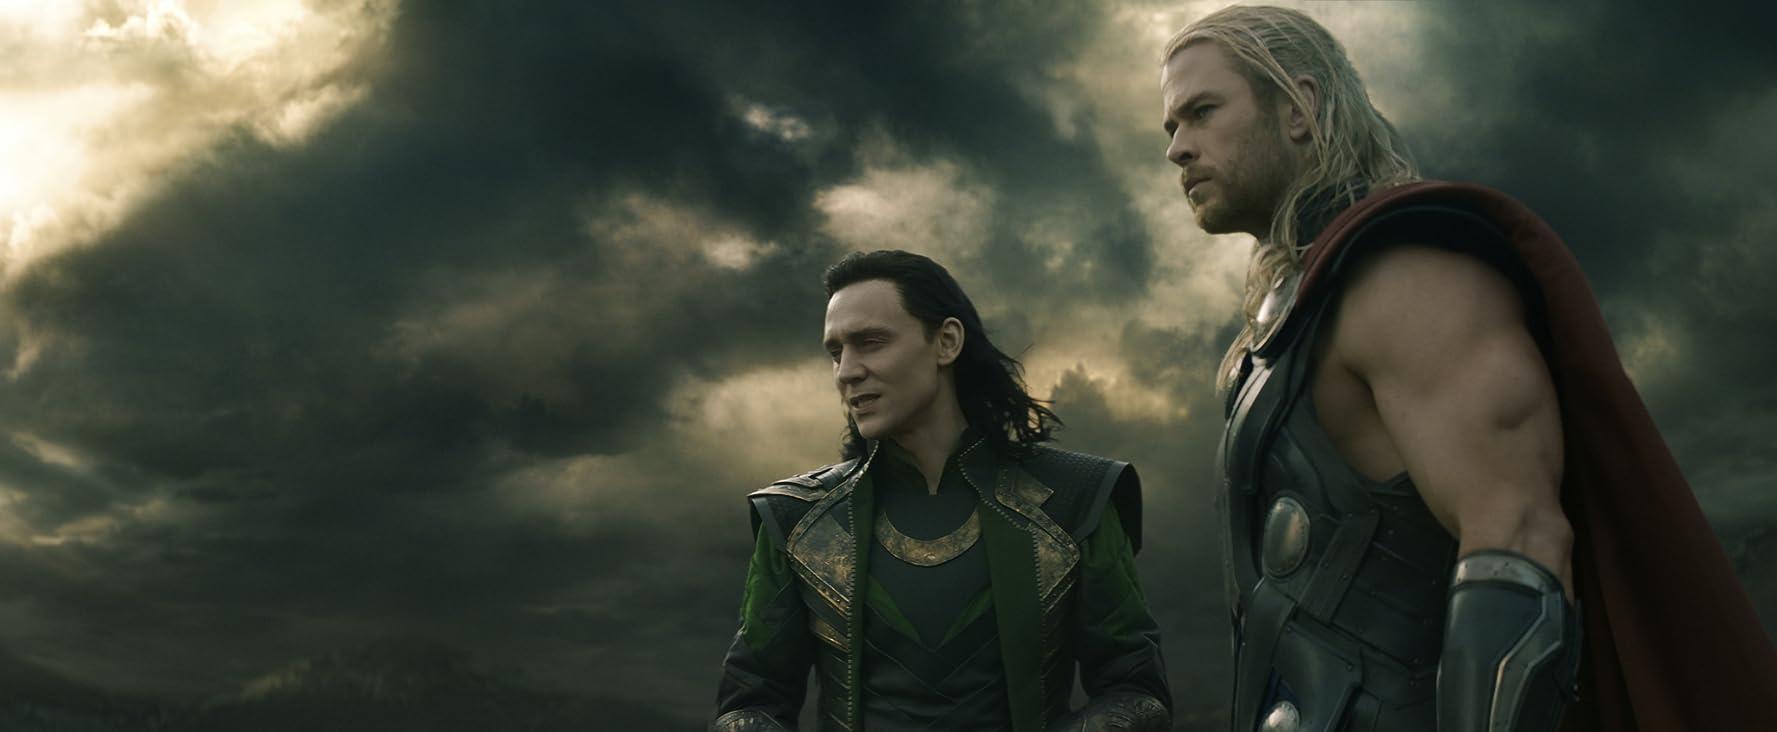 Tom Hiddleston and Chris Hemsworth in Thor: The Dark World (2013)